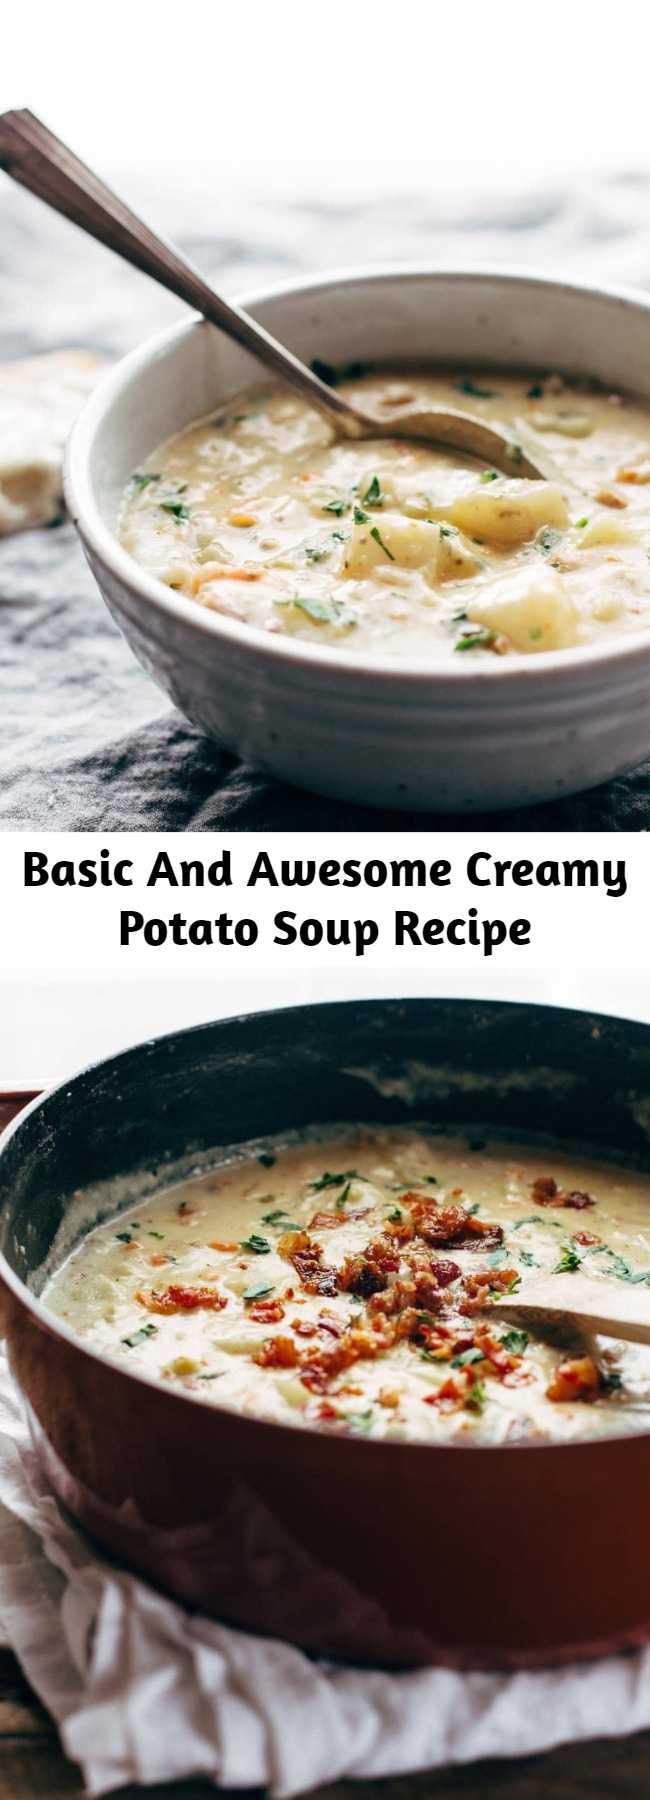 Basic And Awesome Creamy Potato Soup Recipe